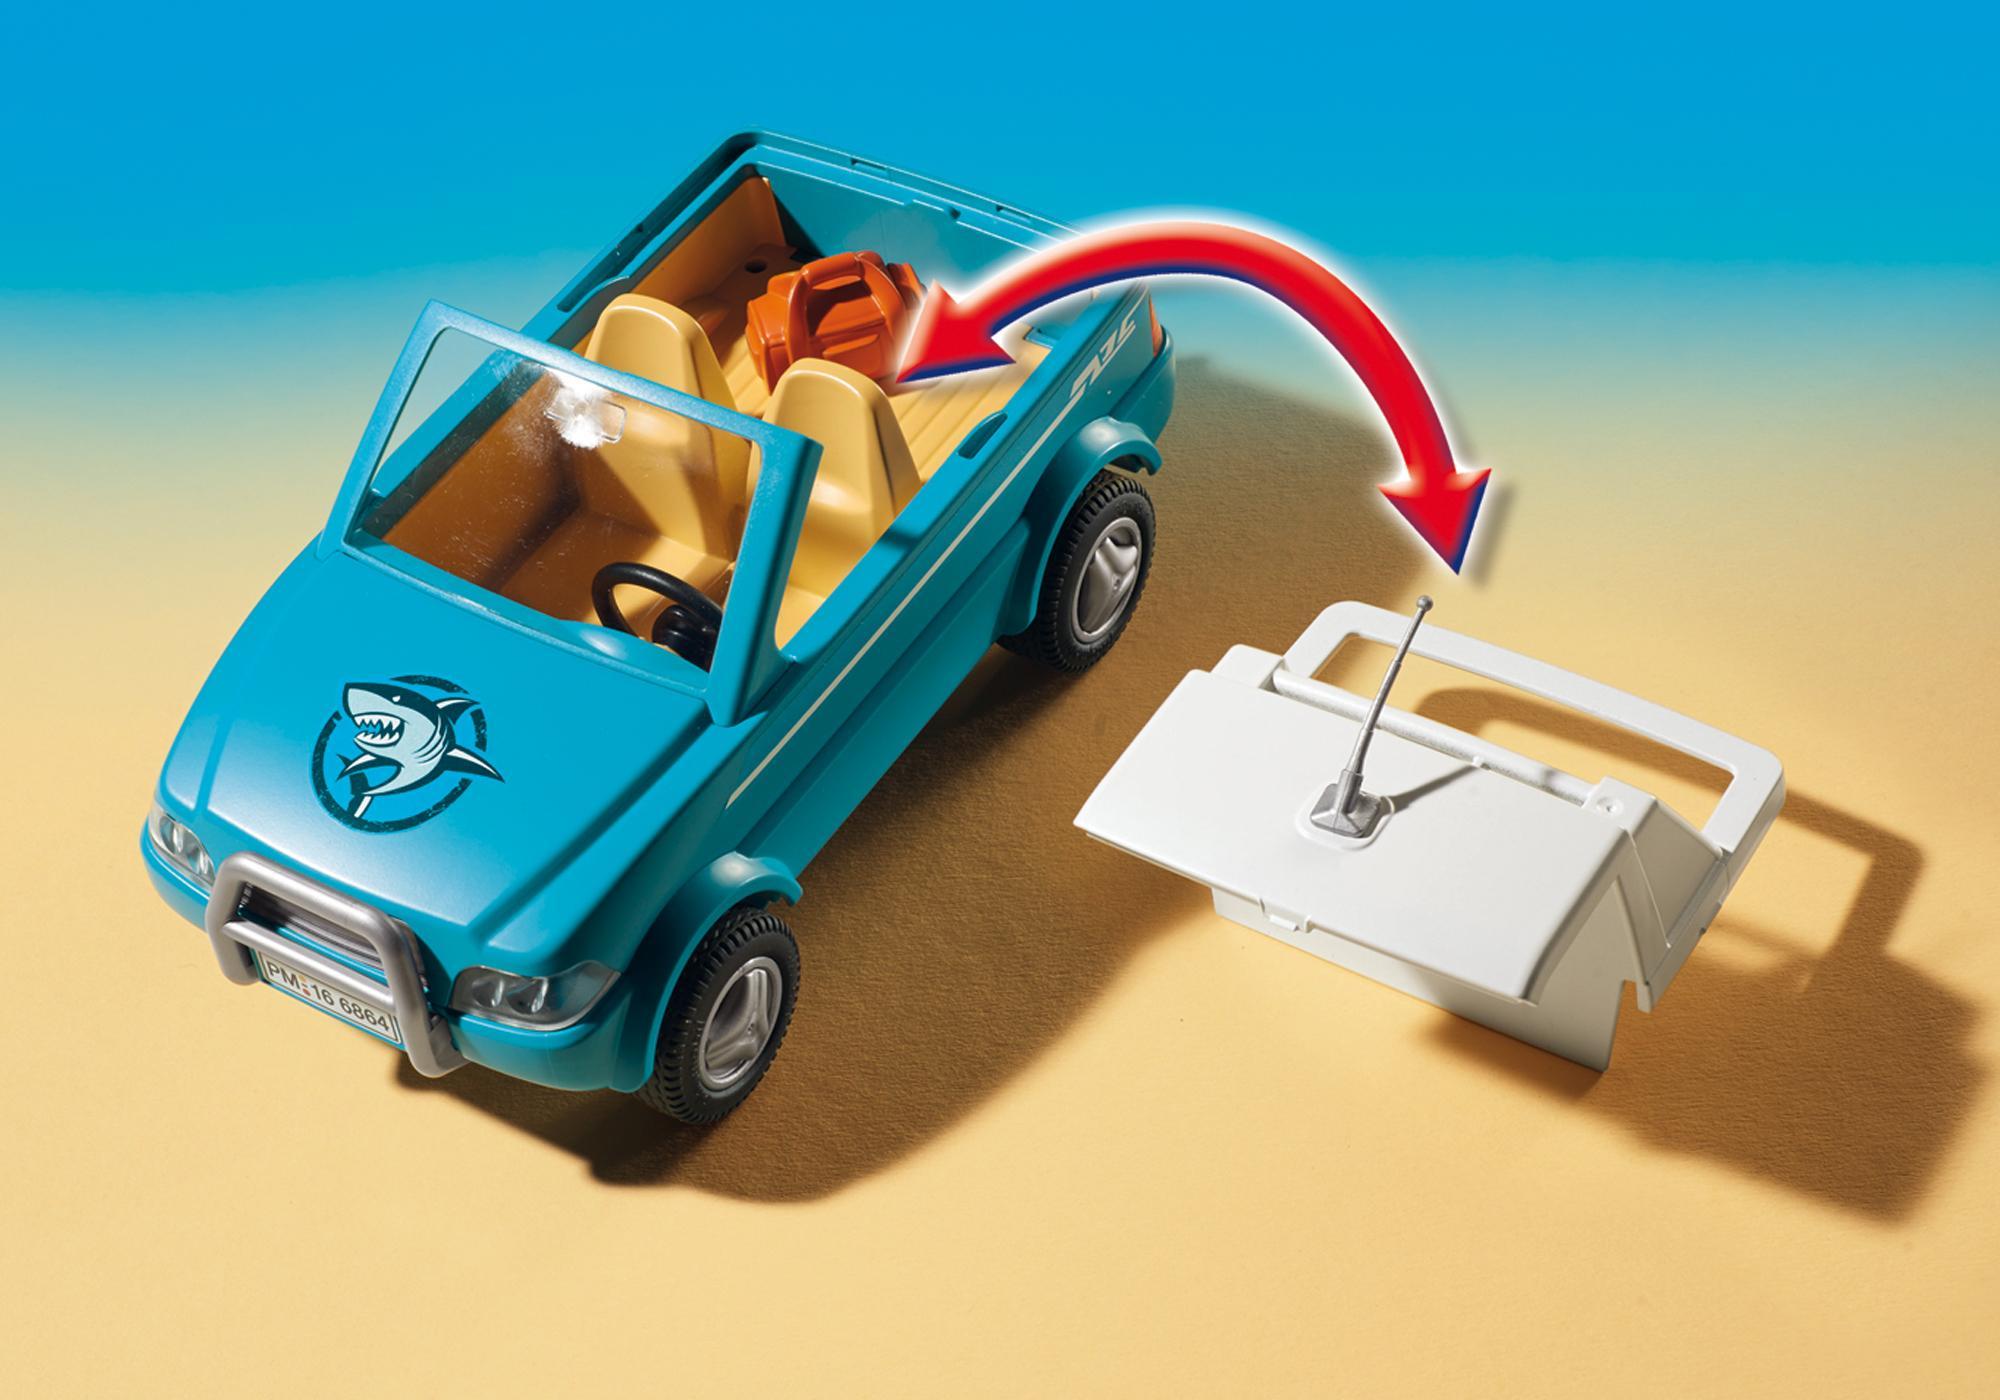 http://media.playmobil.com/i/playmobil/6864_product_extra1/Pick-up met speedboot met onderwatermotor